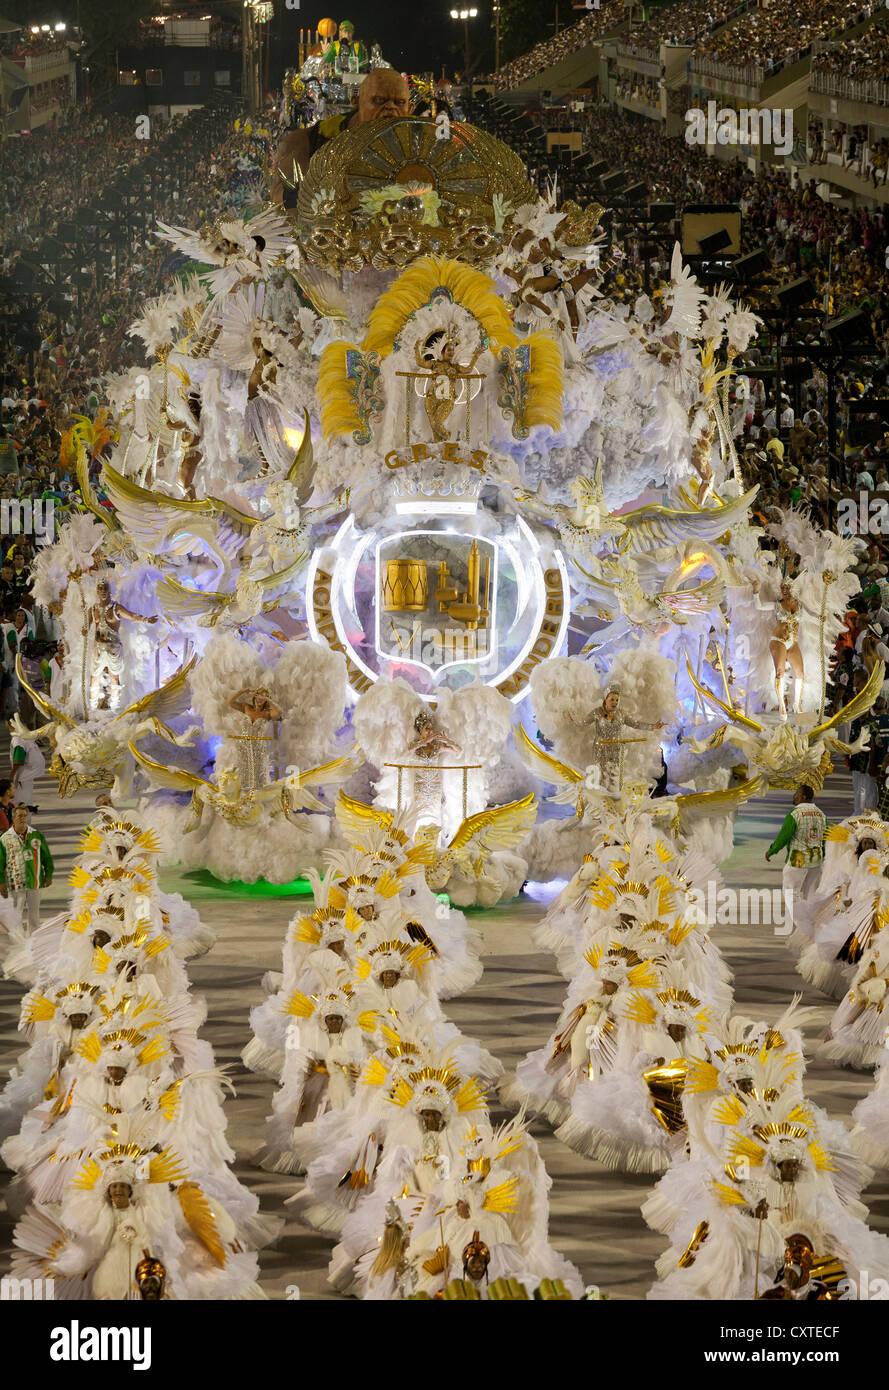 Elaborate Float in Carnival Rio de Janeiro Brazil - Stock Image